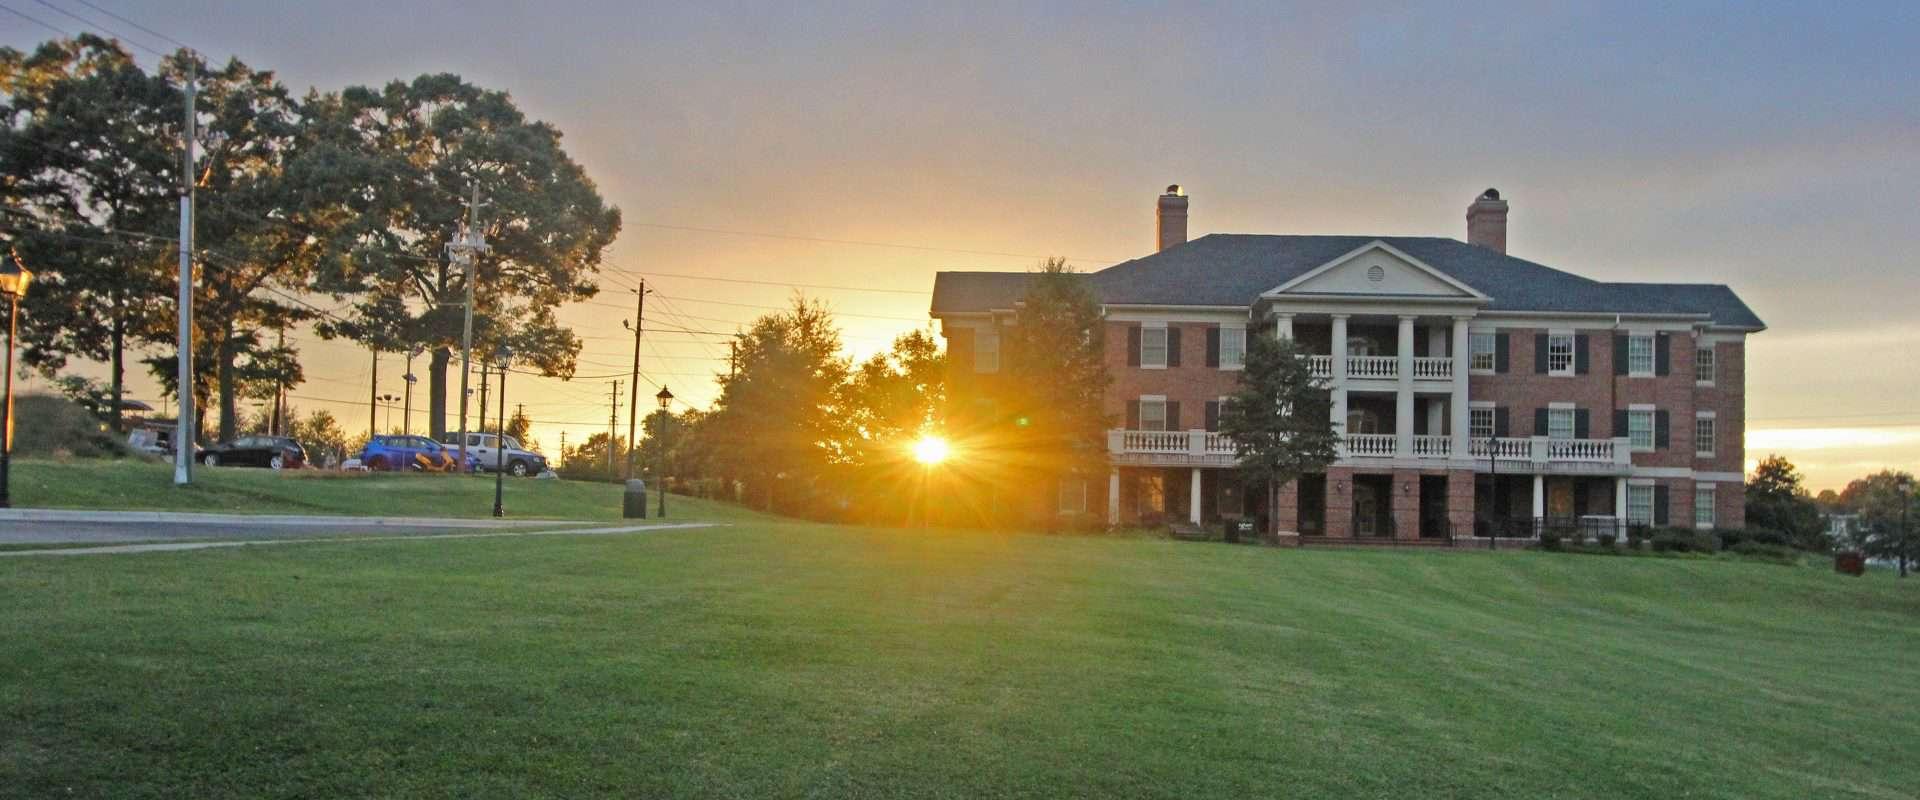 Bingham residence hall at sunset.